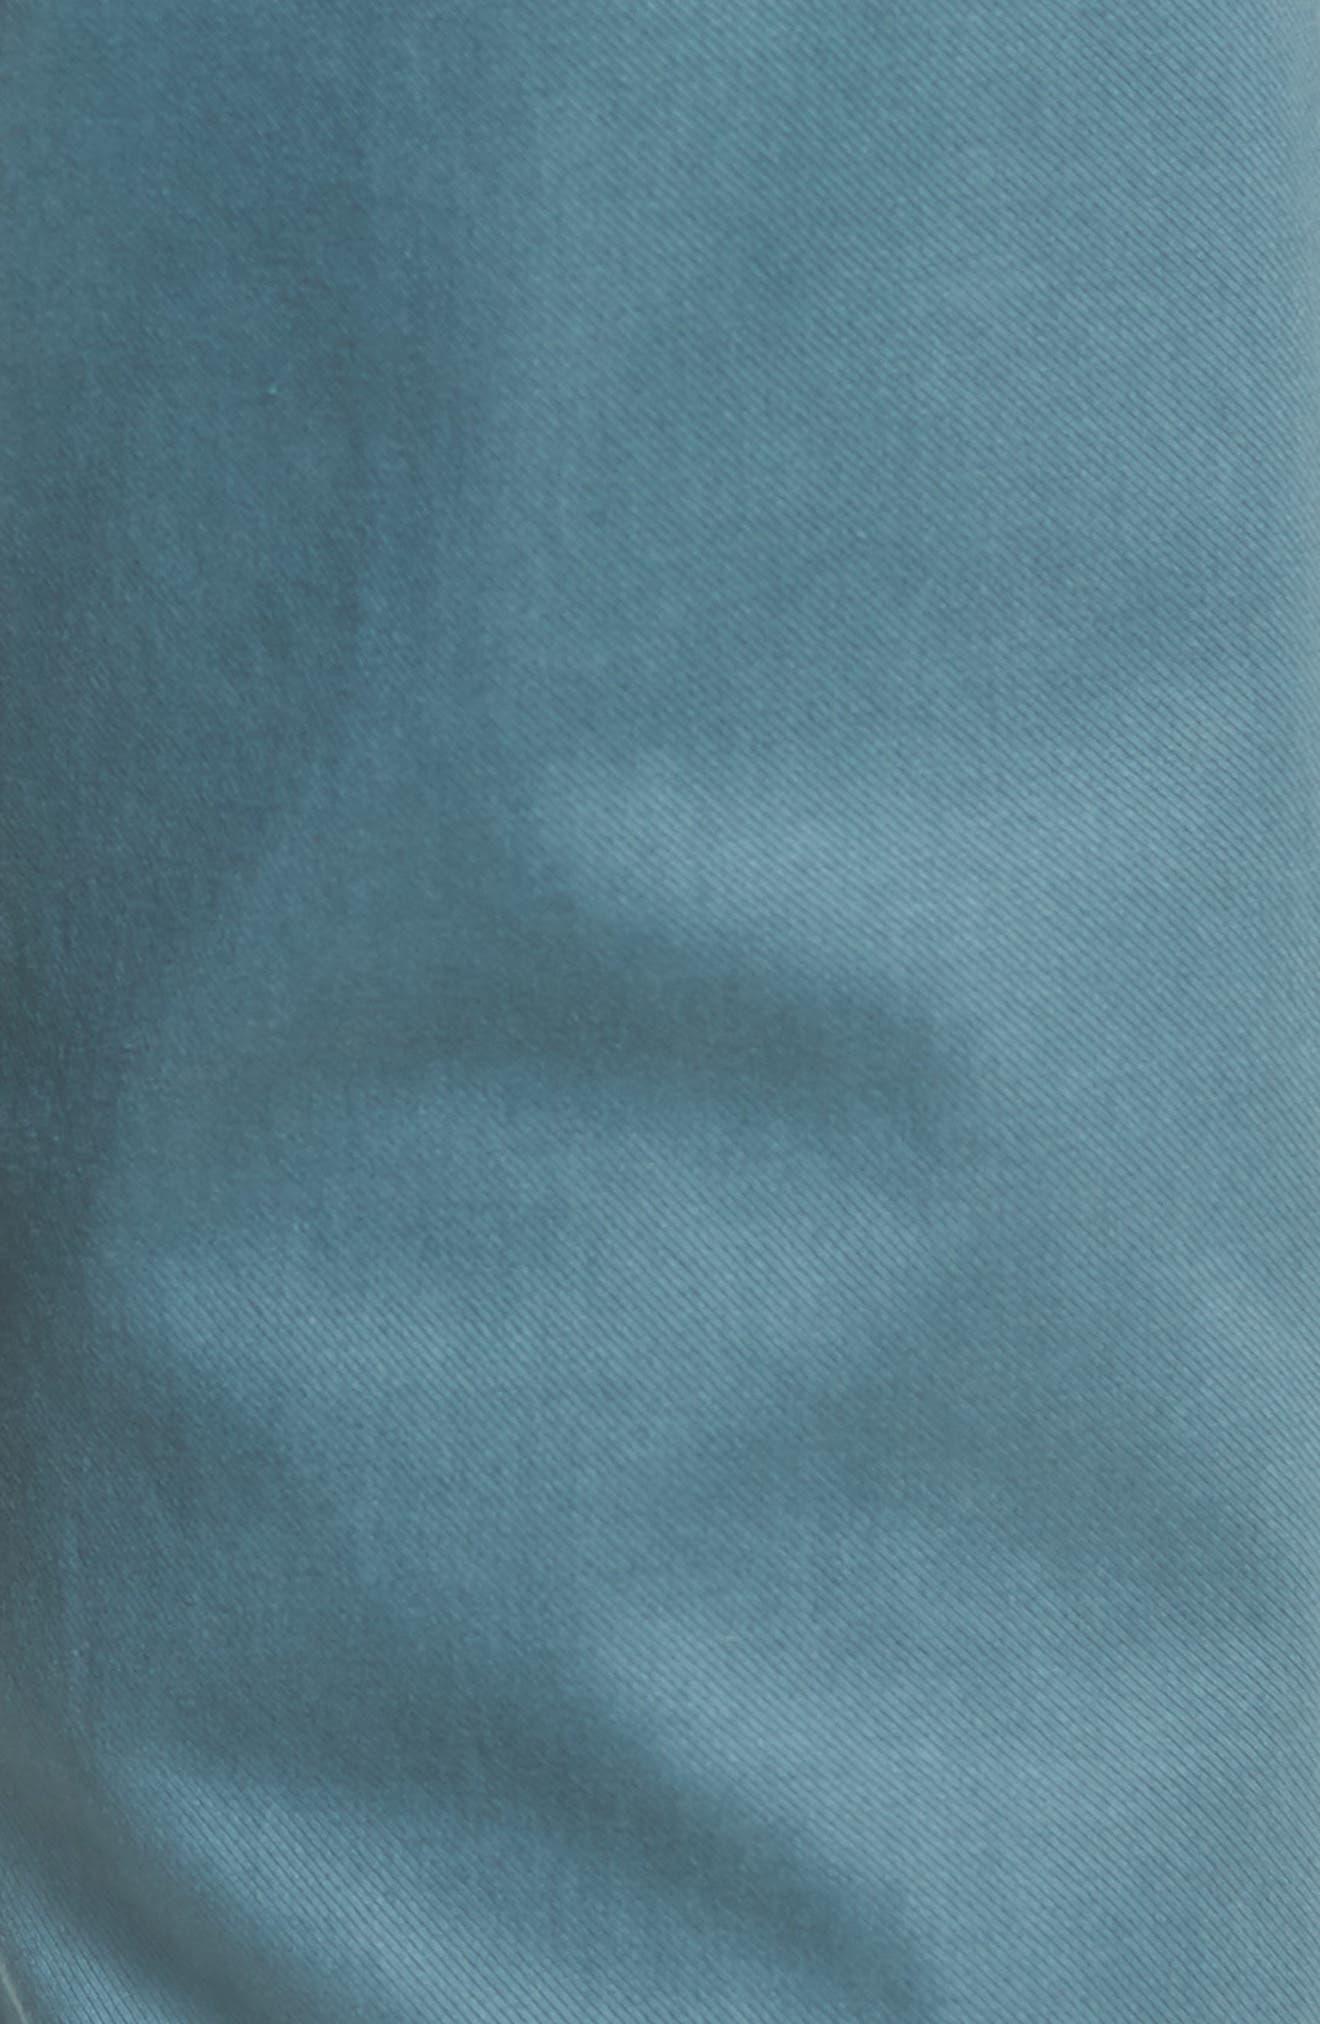 Blake Slim Fit Jeans,                             Alternate thumbnail 5, color,                             497